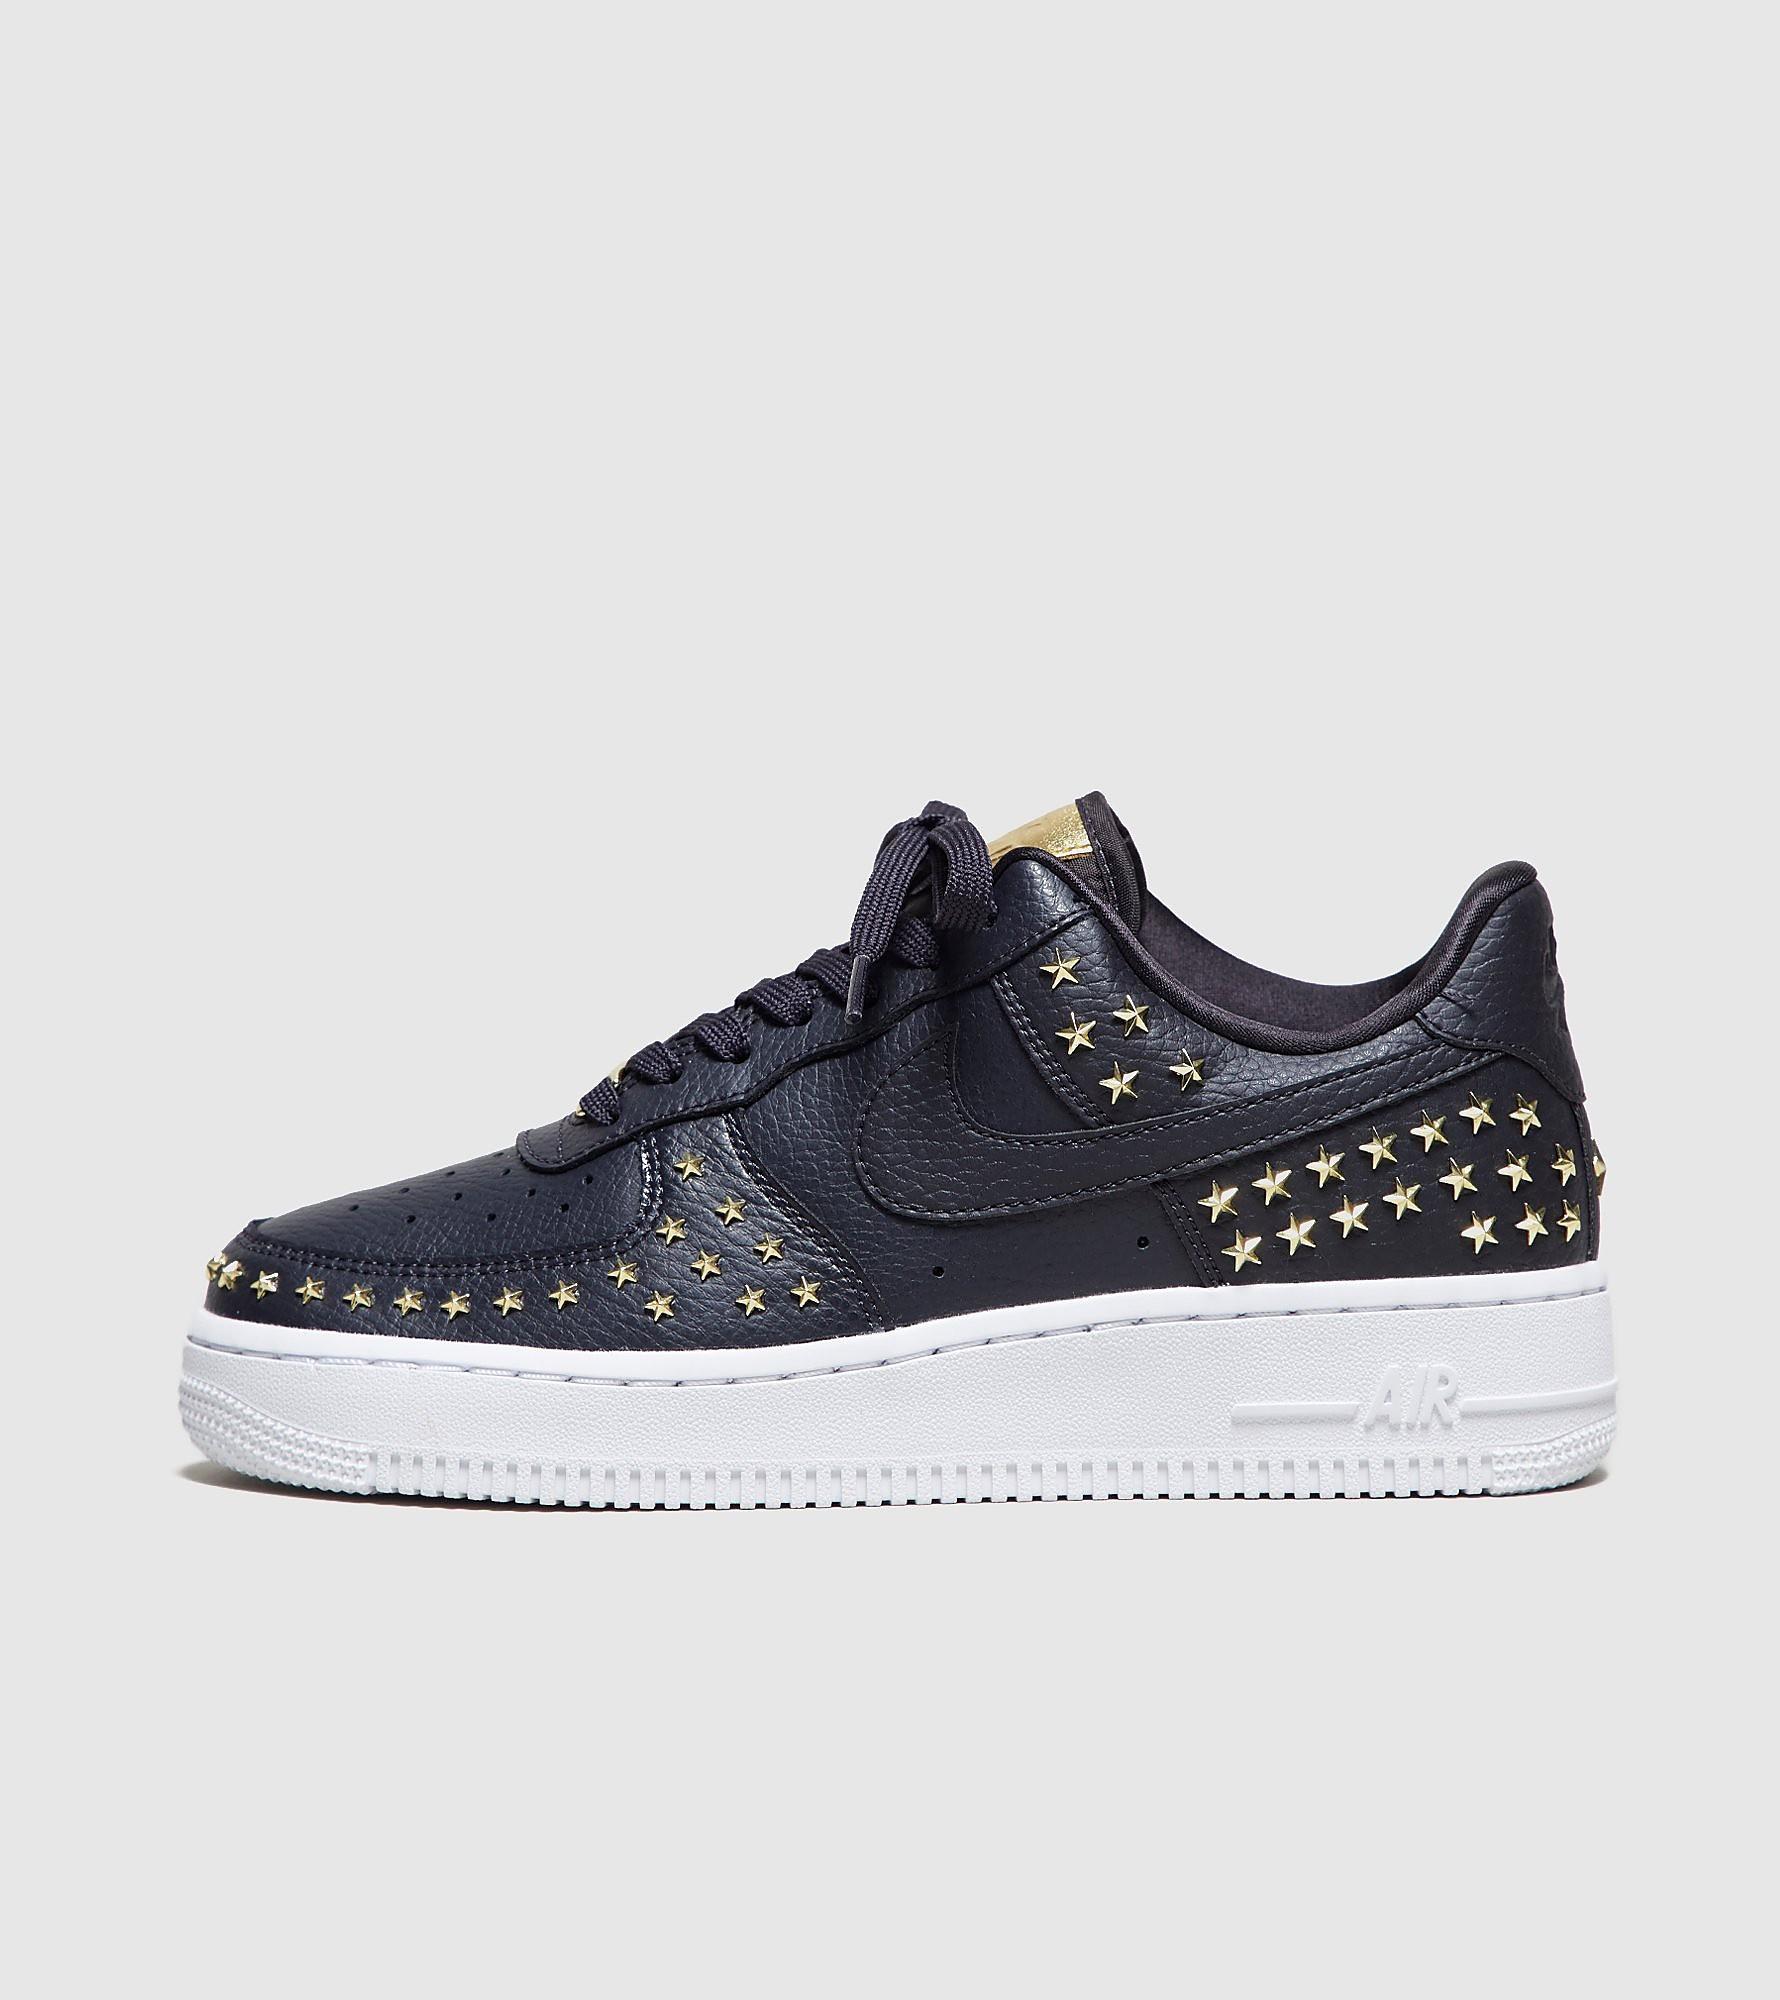 Nike Air Force 1 Low XX Women's